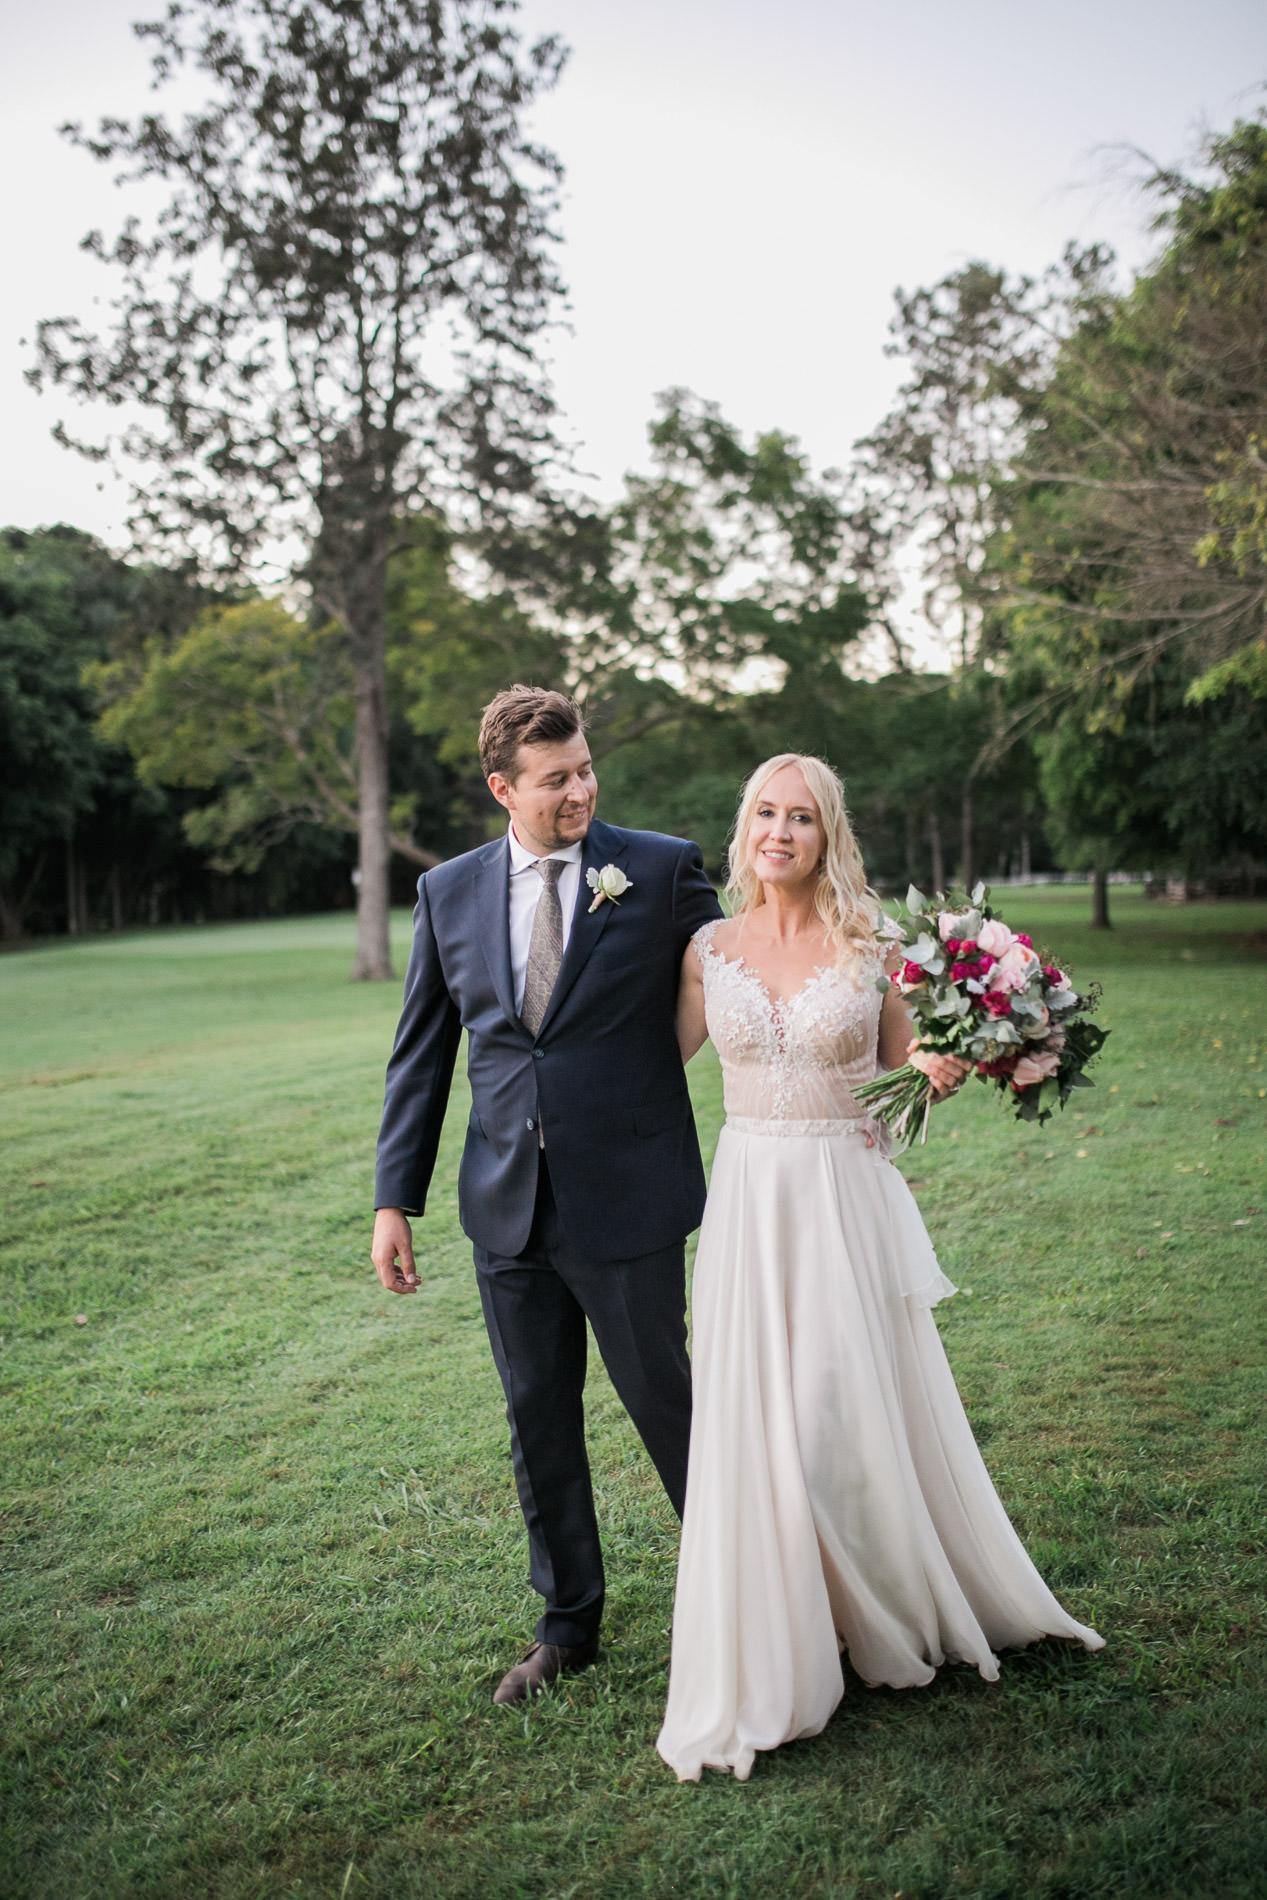 True North Photography_Boomerang Farm_Stacey and Isaac_Gold Coast Wedding_Barm Wedding_Hinterland Wedding-175.jpg